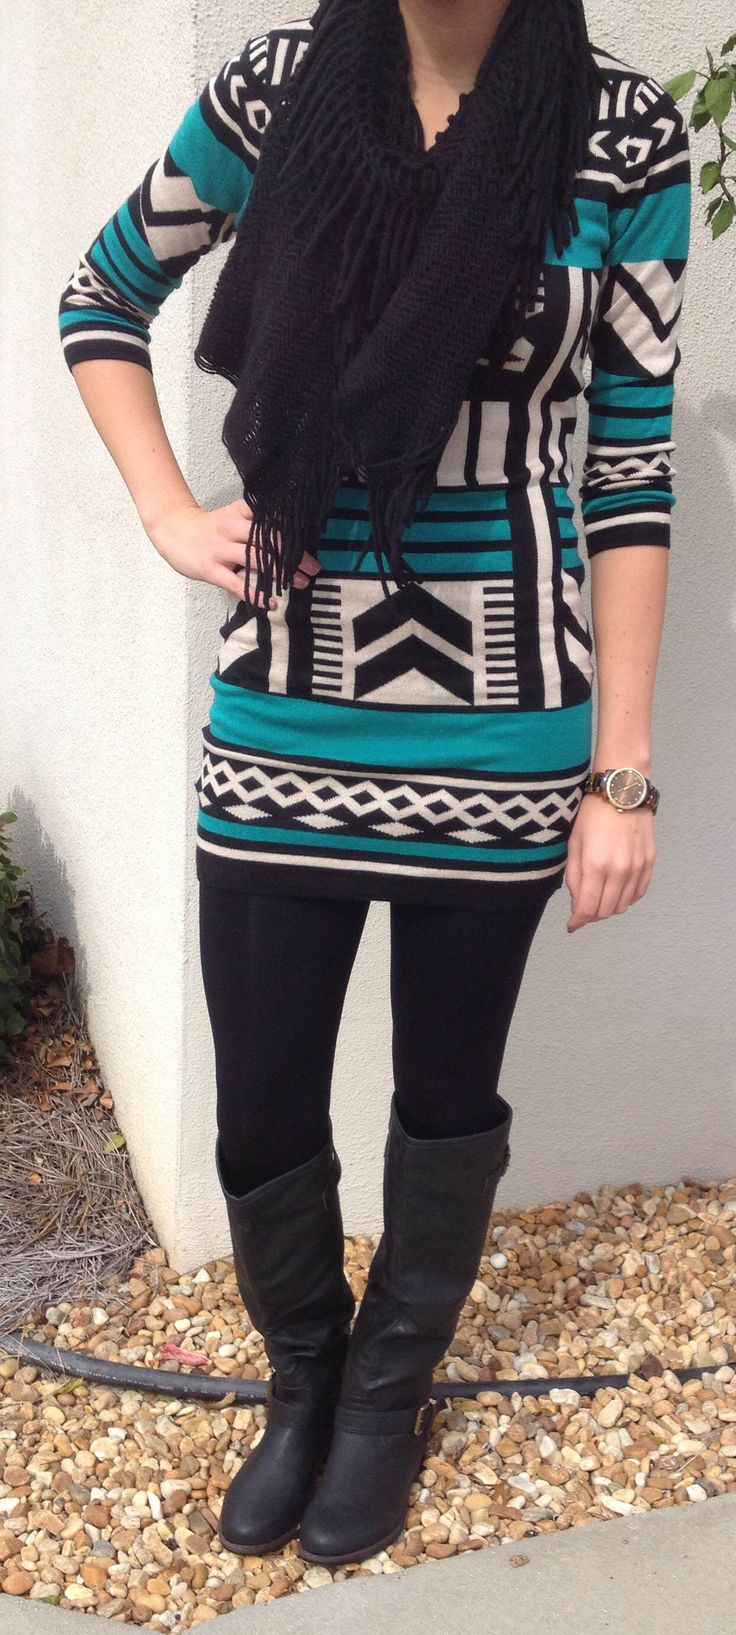 Tribal Print Sweater Dress, Black Leggings, Boots, Black Scarf